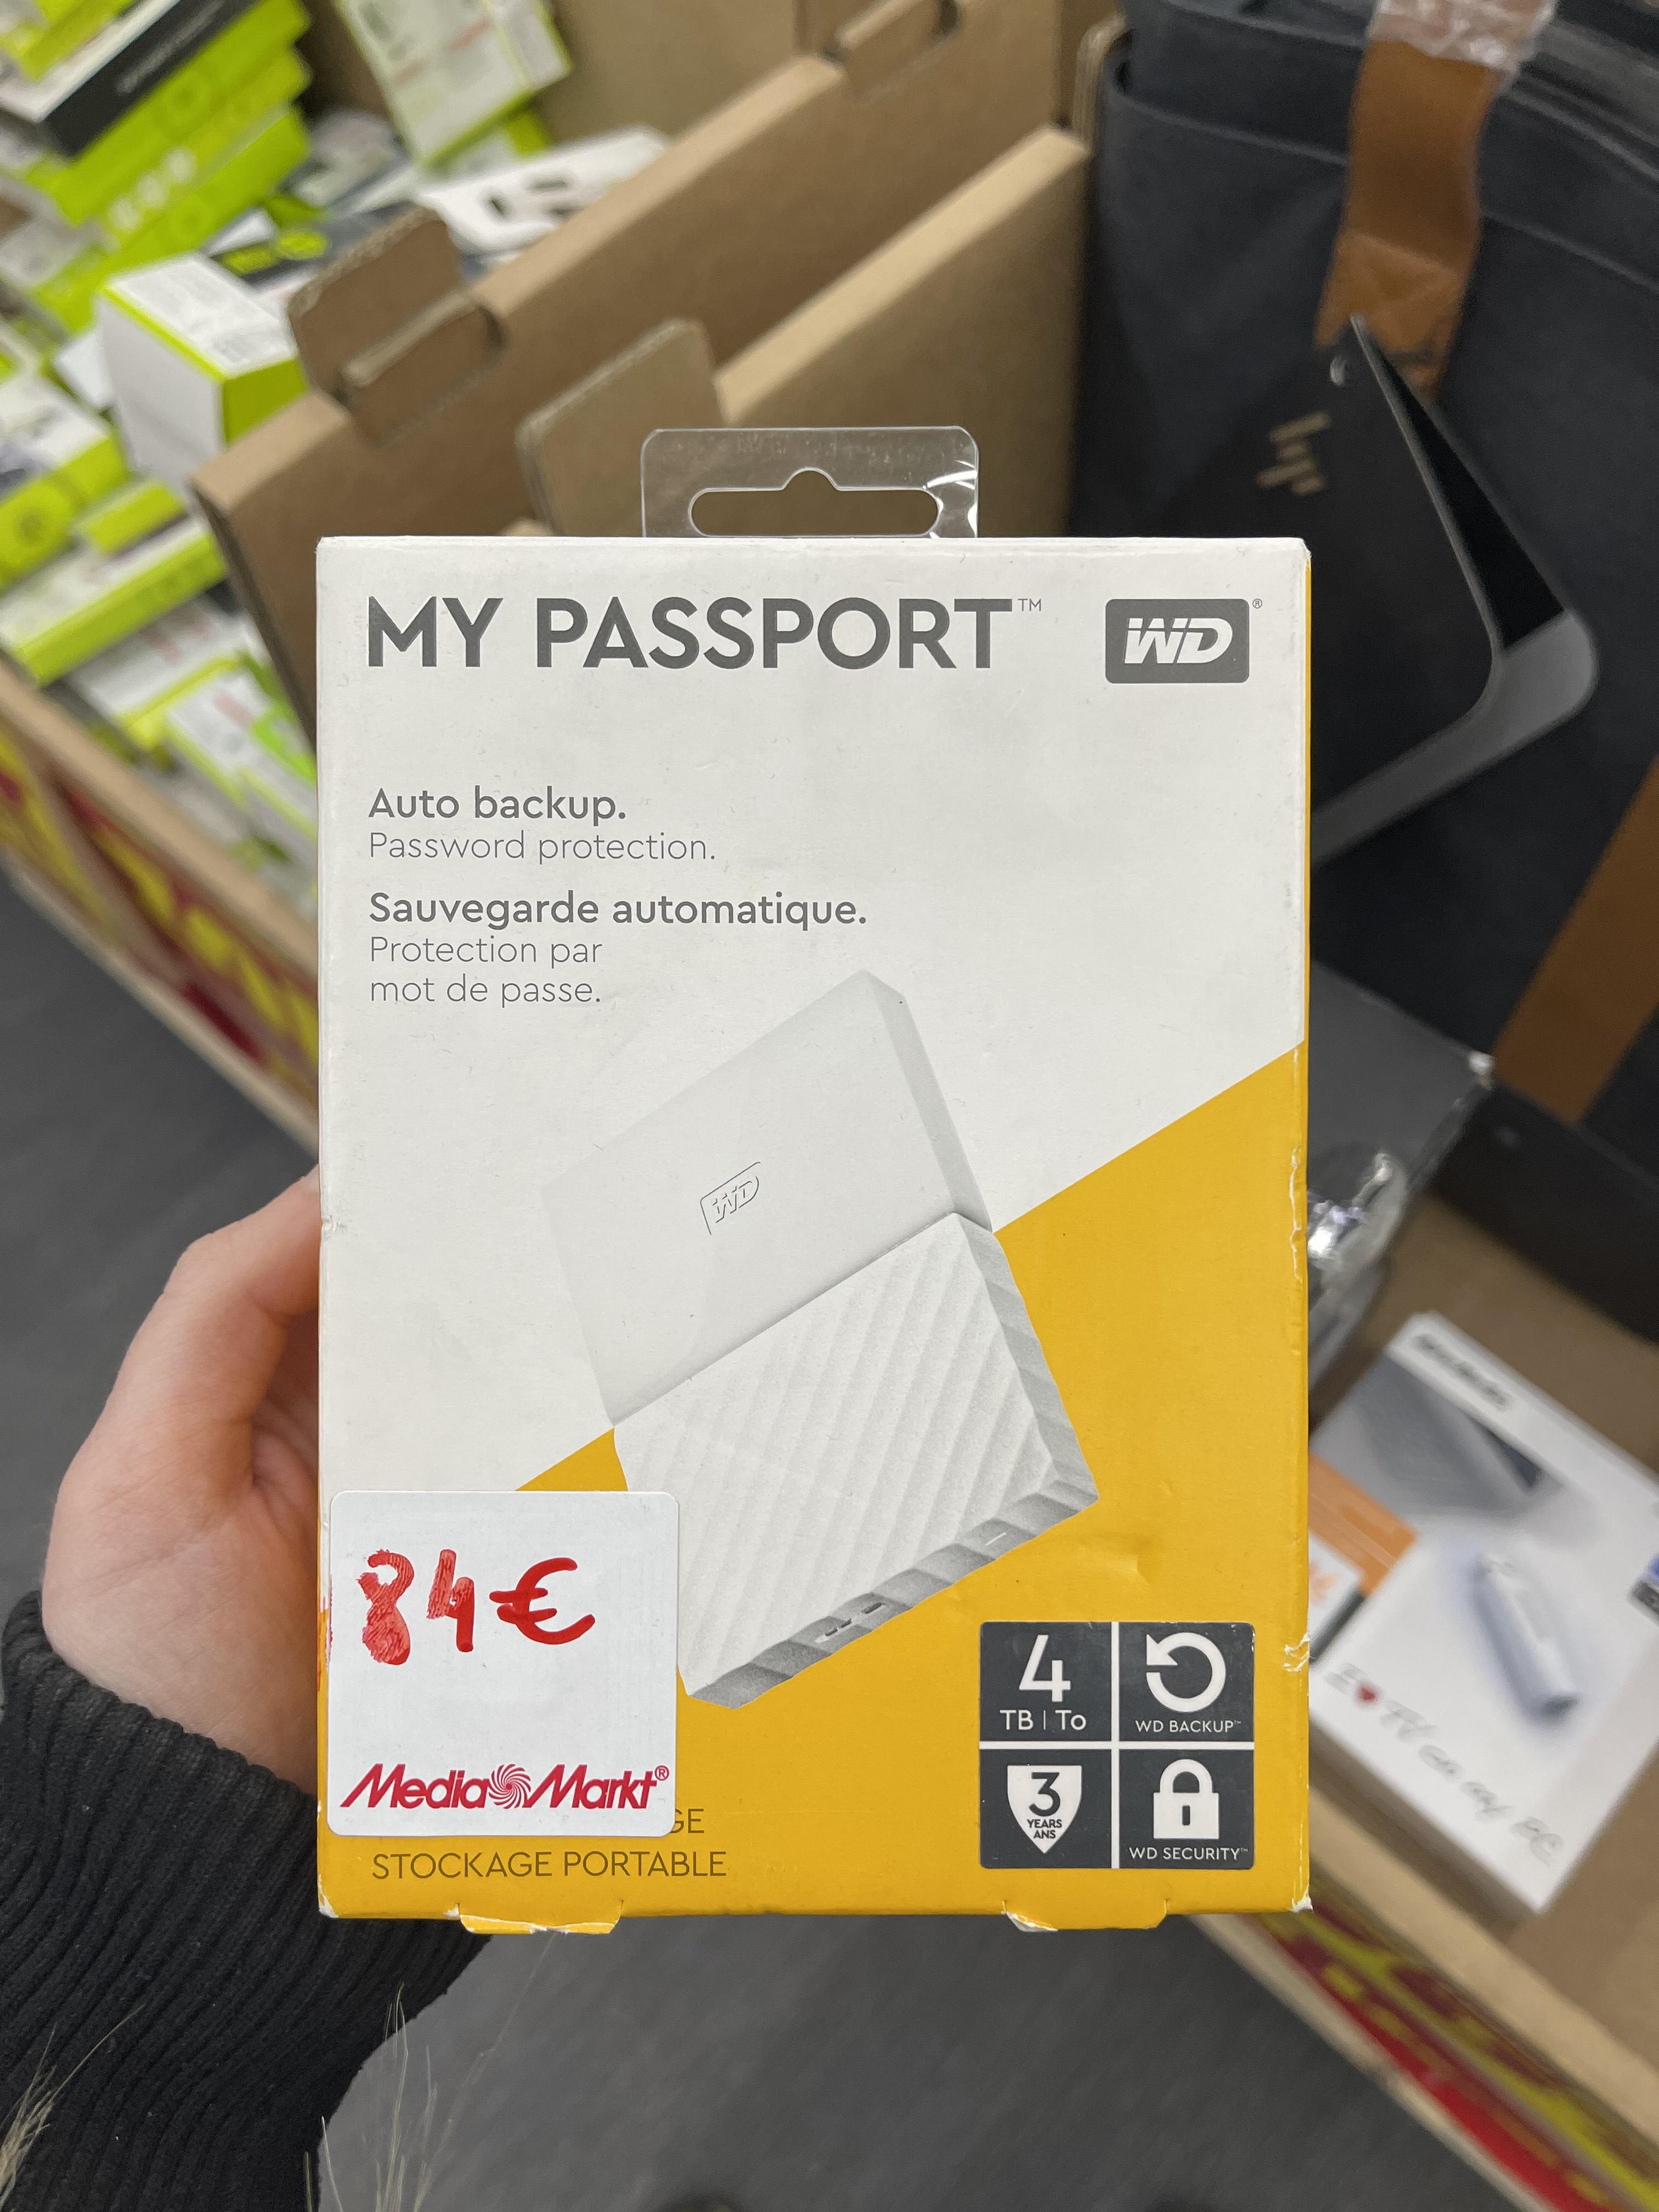 WD My Passport 4TB (Albacete)